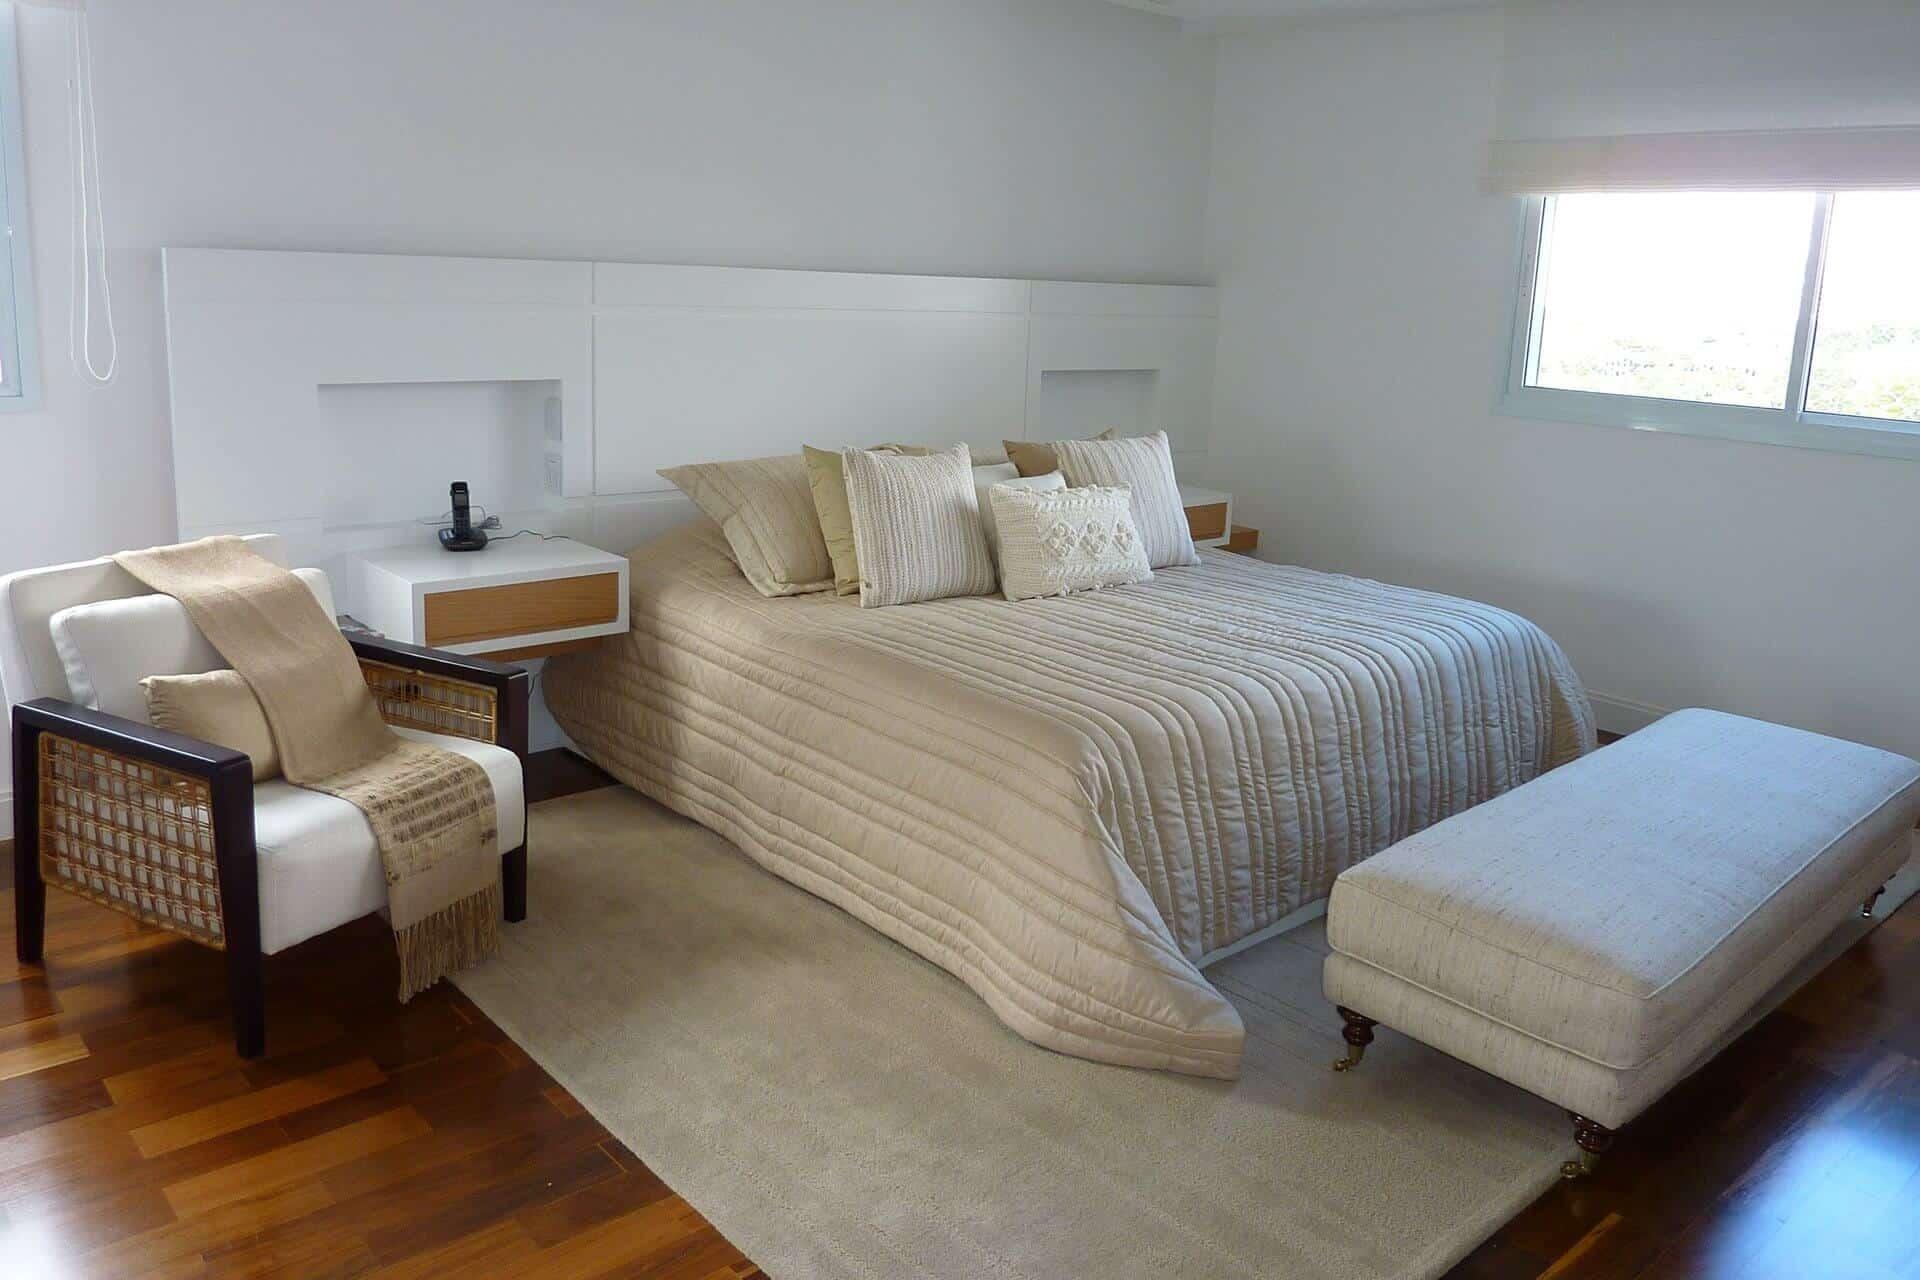 dormitorio-planejado_moveis-sob-medida-galeria-164